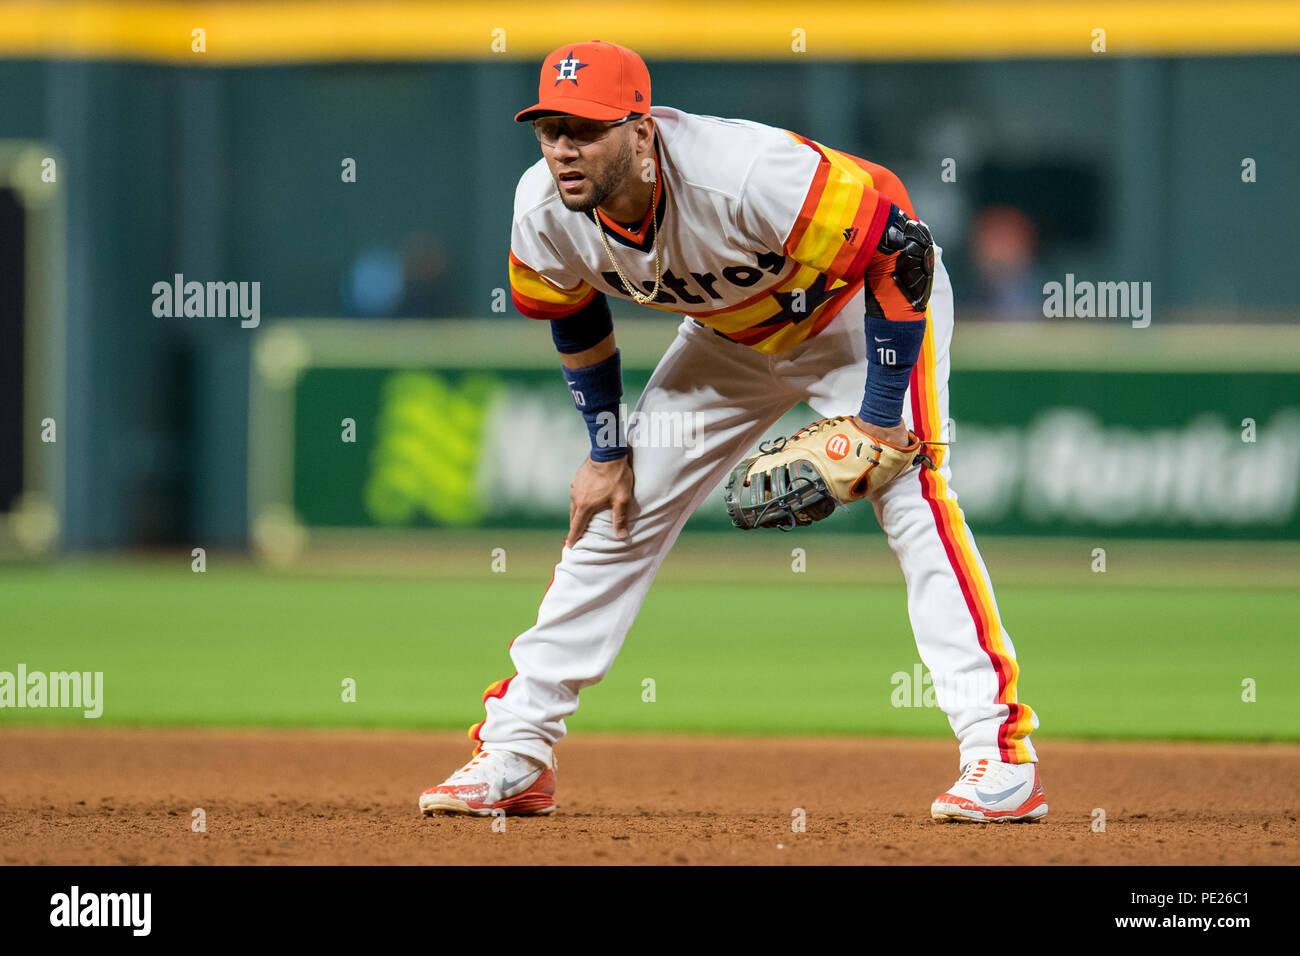 quality design 92552 b3697 August 10, 2018: Houston Astros first baseman Yuli Gurriel ...